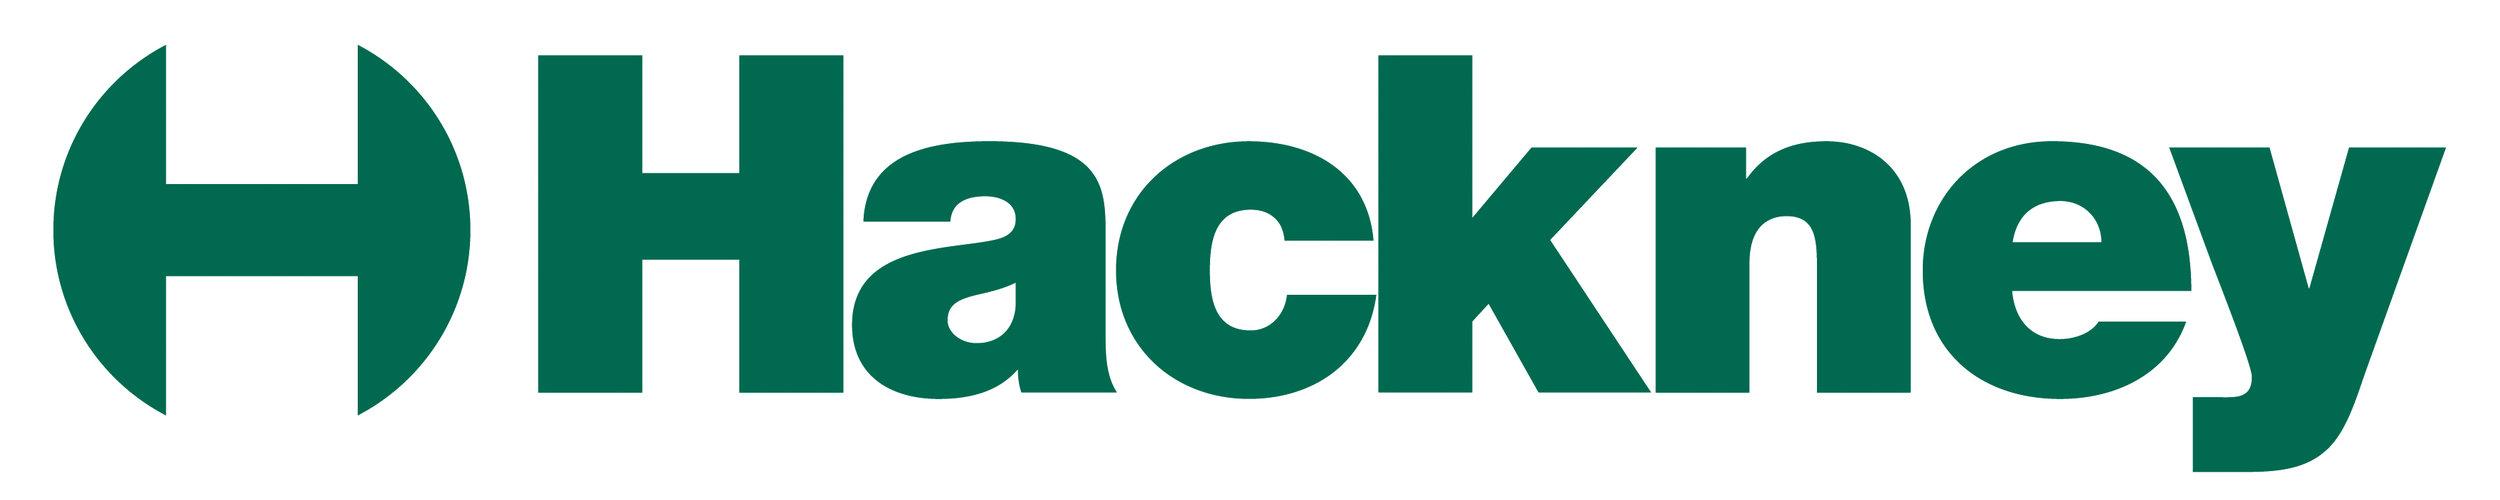 Hackney_Logo RGB lrg.jpg